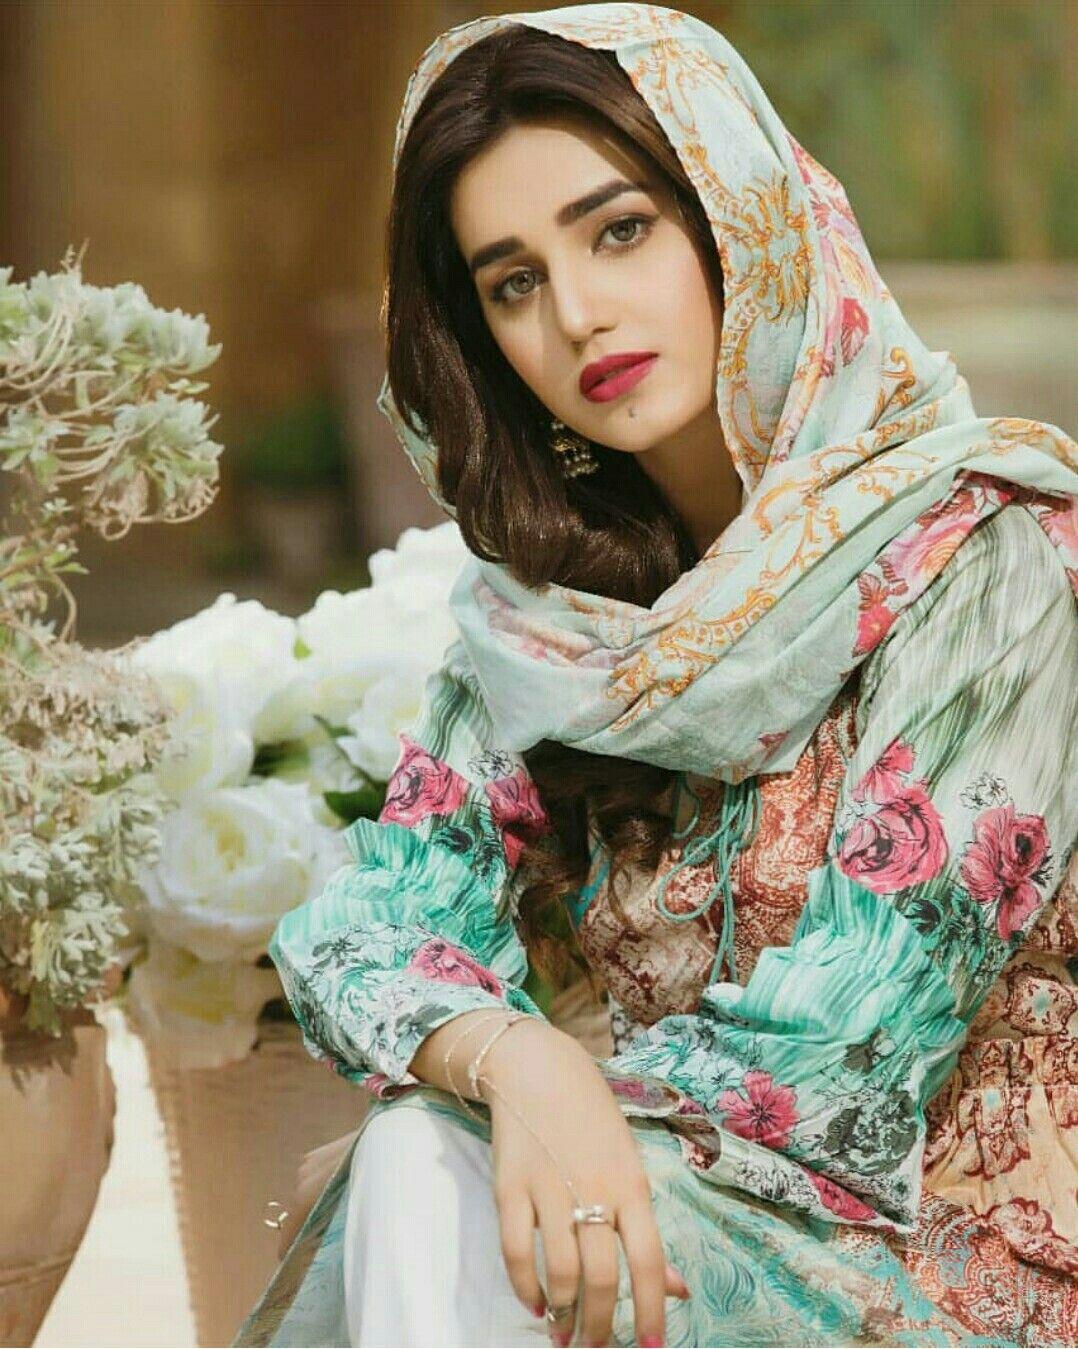 Anum Fayyaz sexy actress Height, Weight, Age, Body Measurement, Wedding, Bra Size, Husband, DOB, instagram, facebook, twitter, wiki